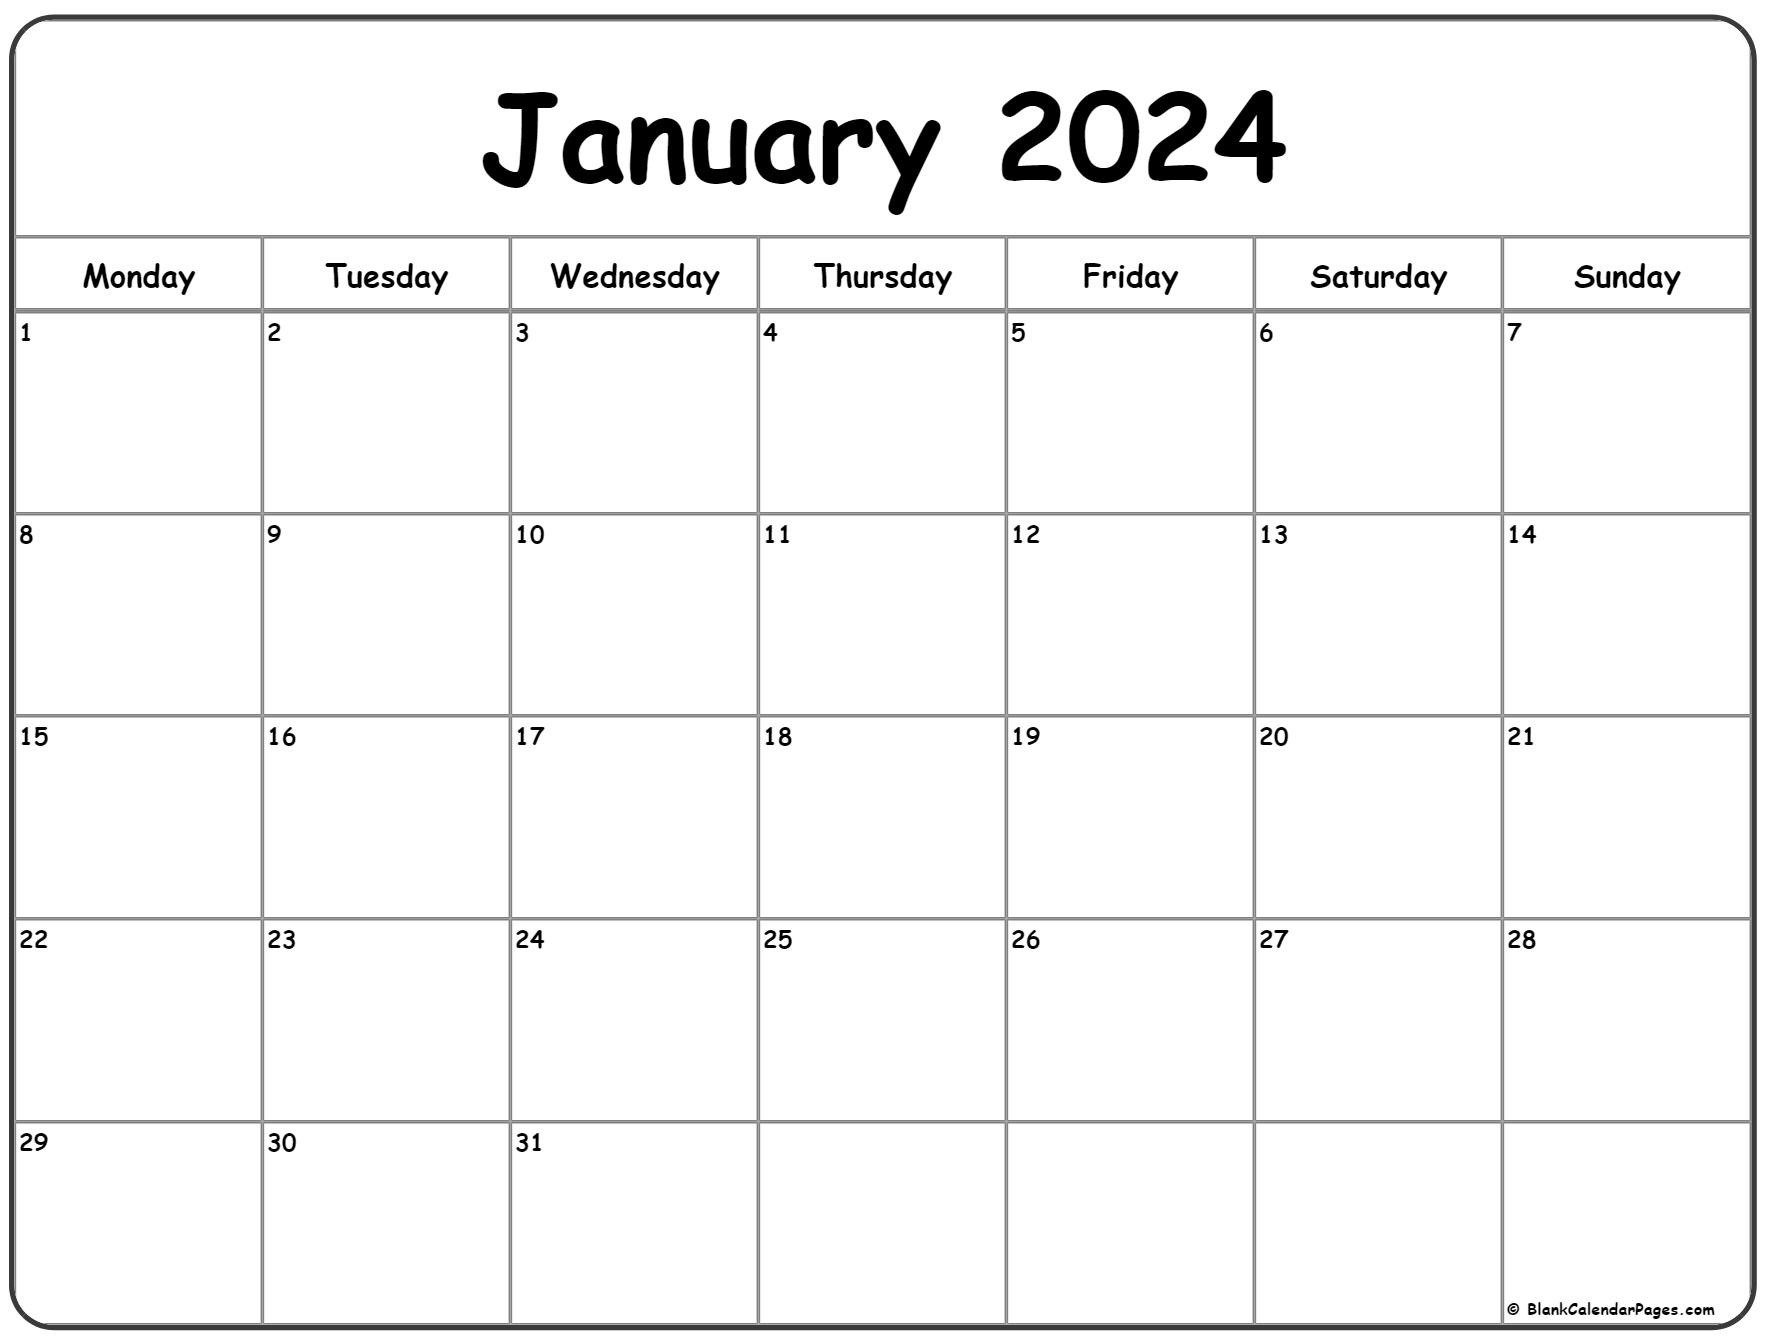 January 2024 Monday calendar. Monday to Sunday